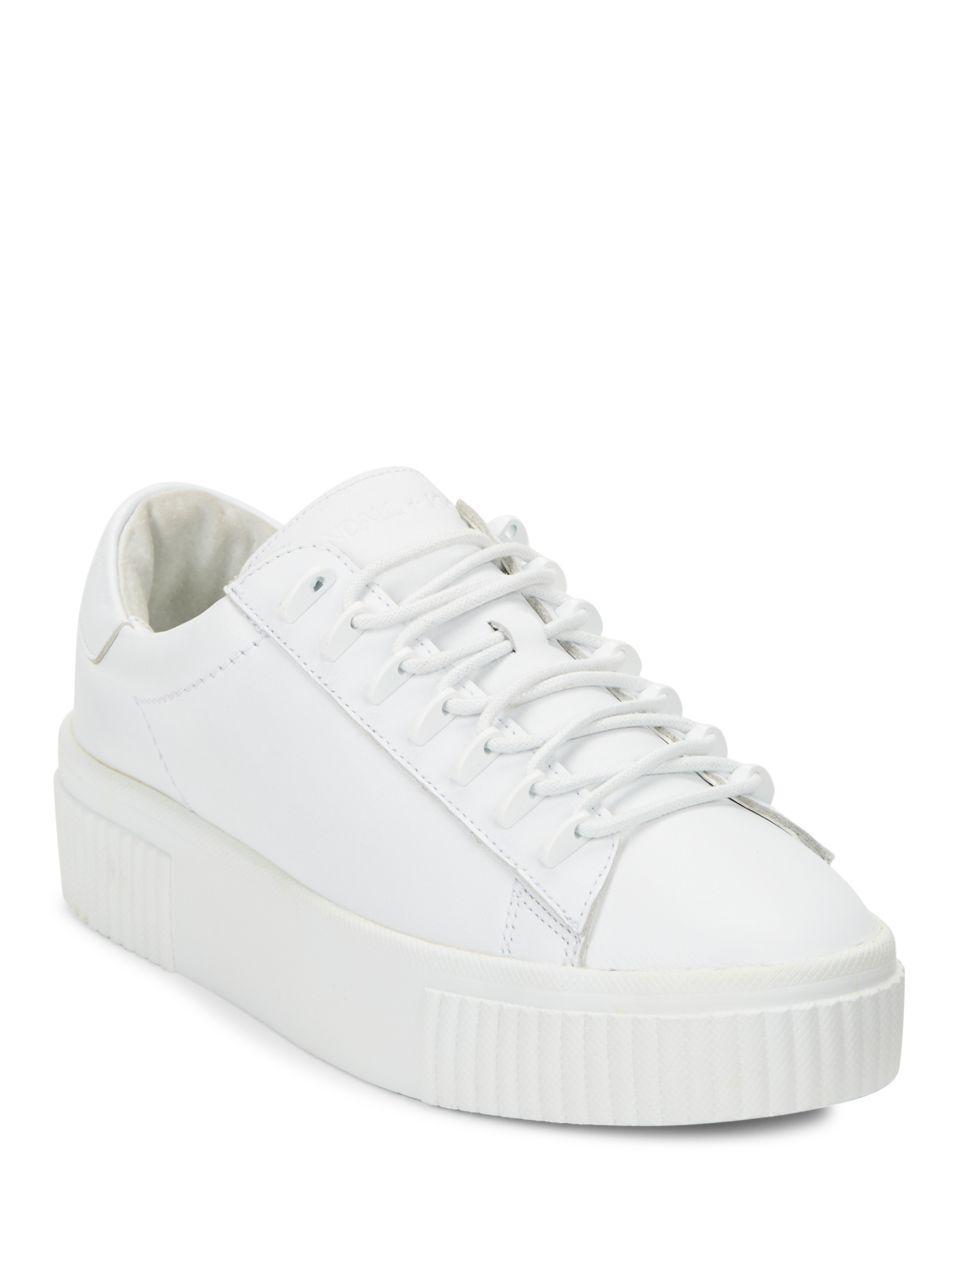 Read more White Leather Flatform Sneakers bRbcnWDu3